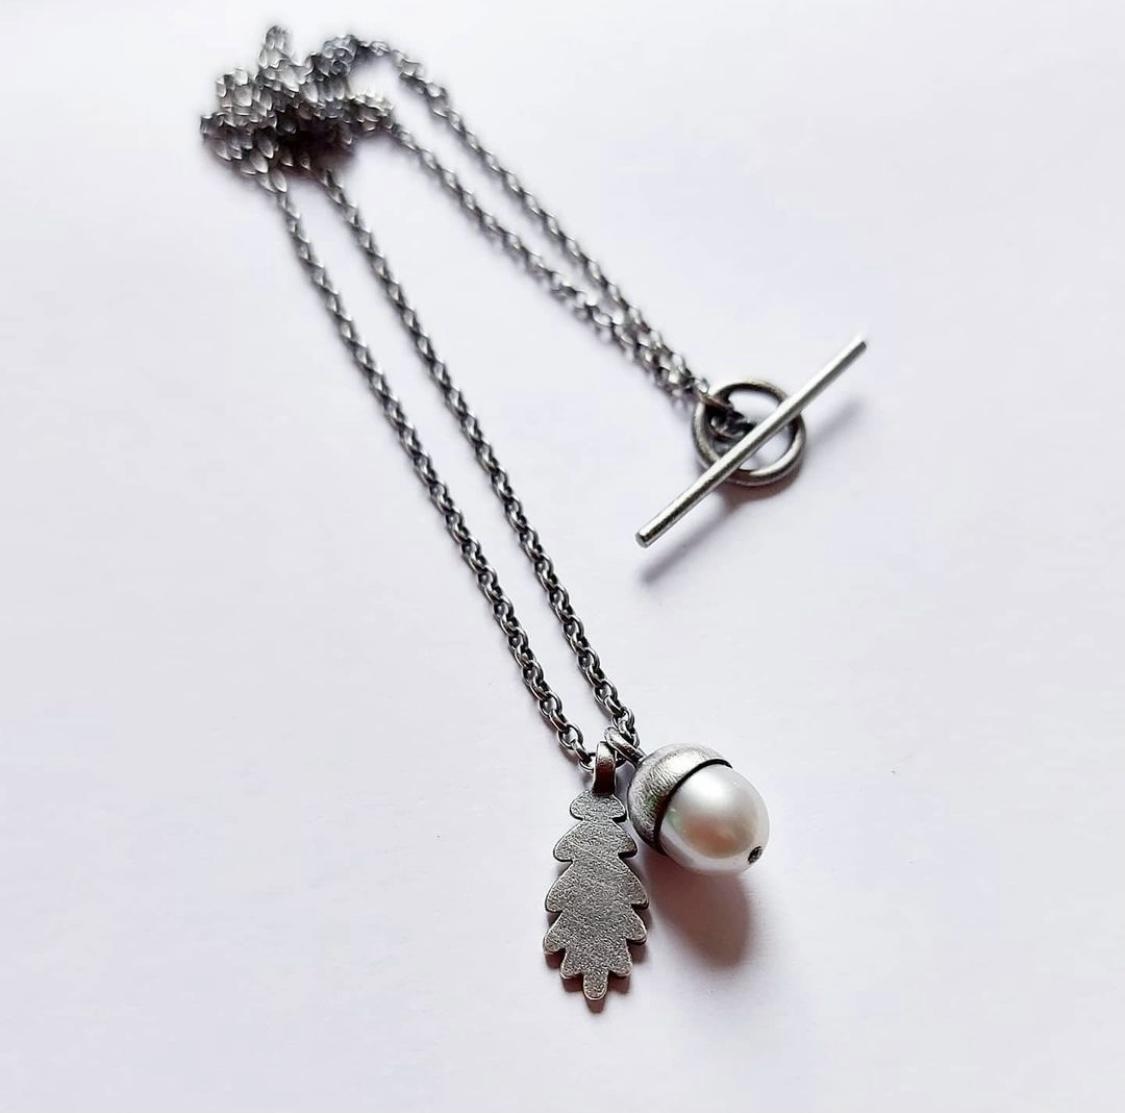 Acorn and oak leaf pendant necklace by Suzanne Potter of Potter Siskin Jewellery